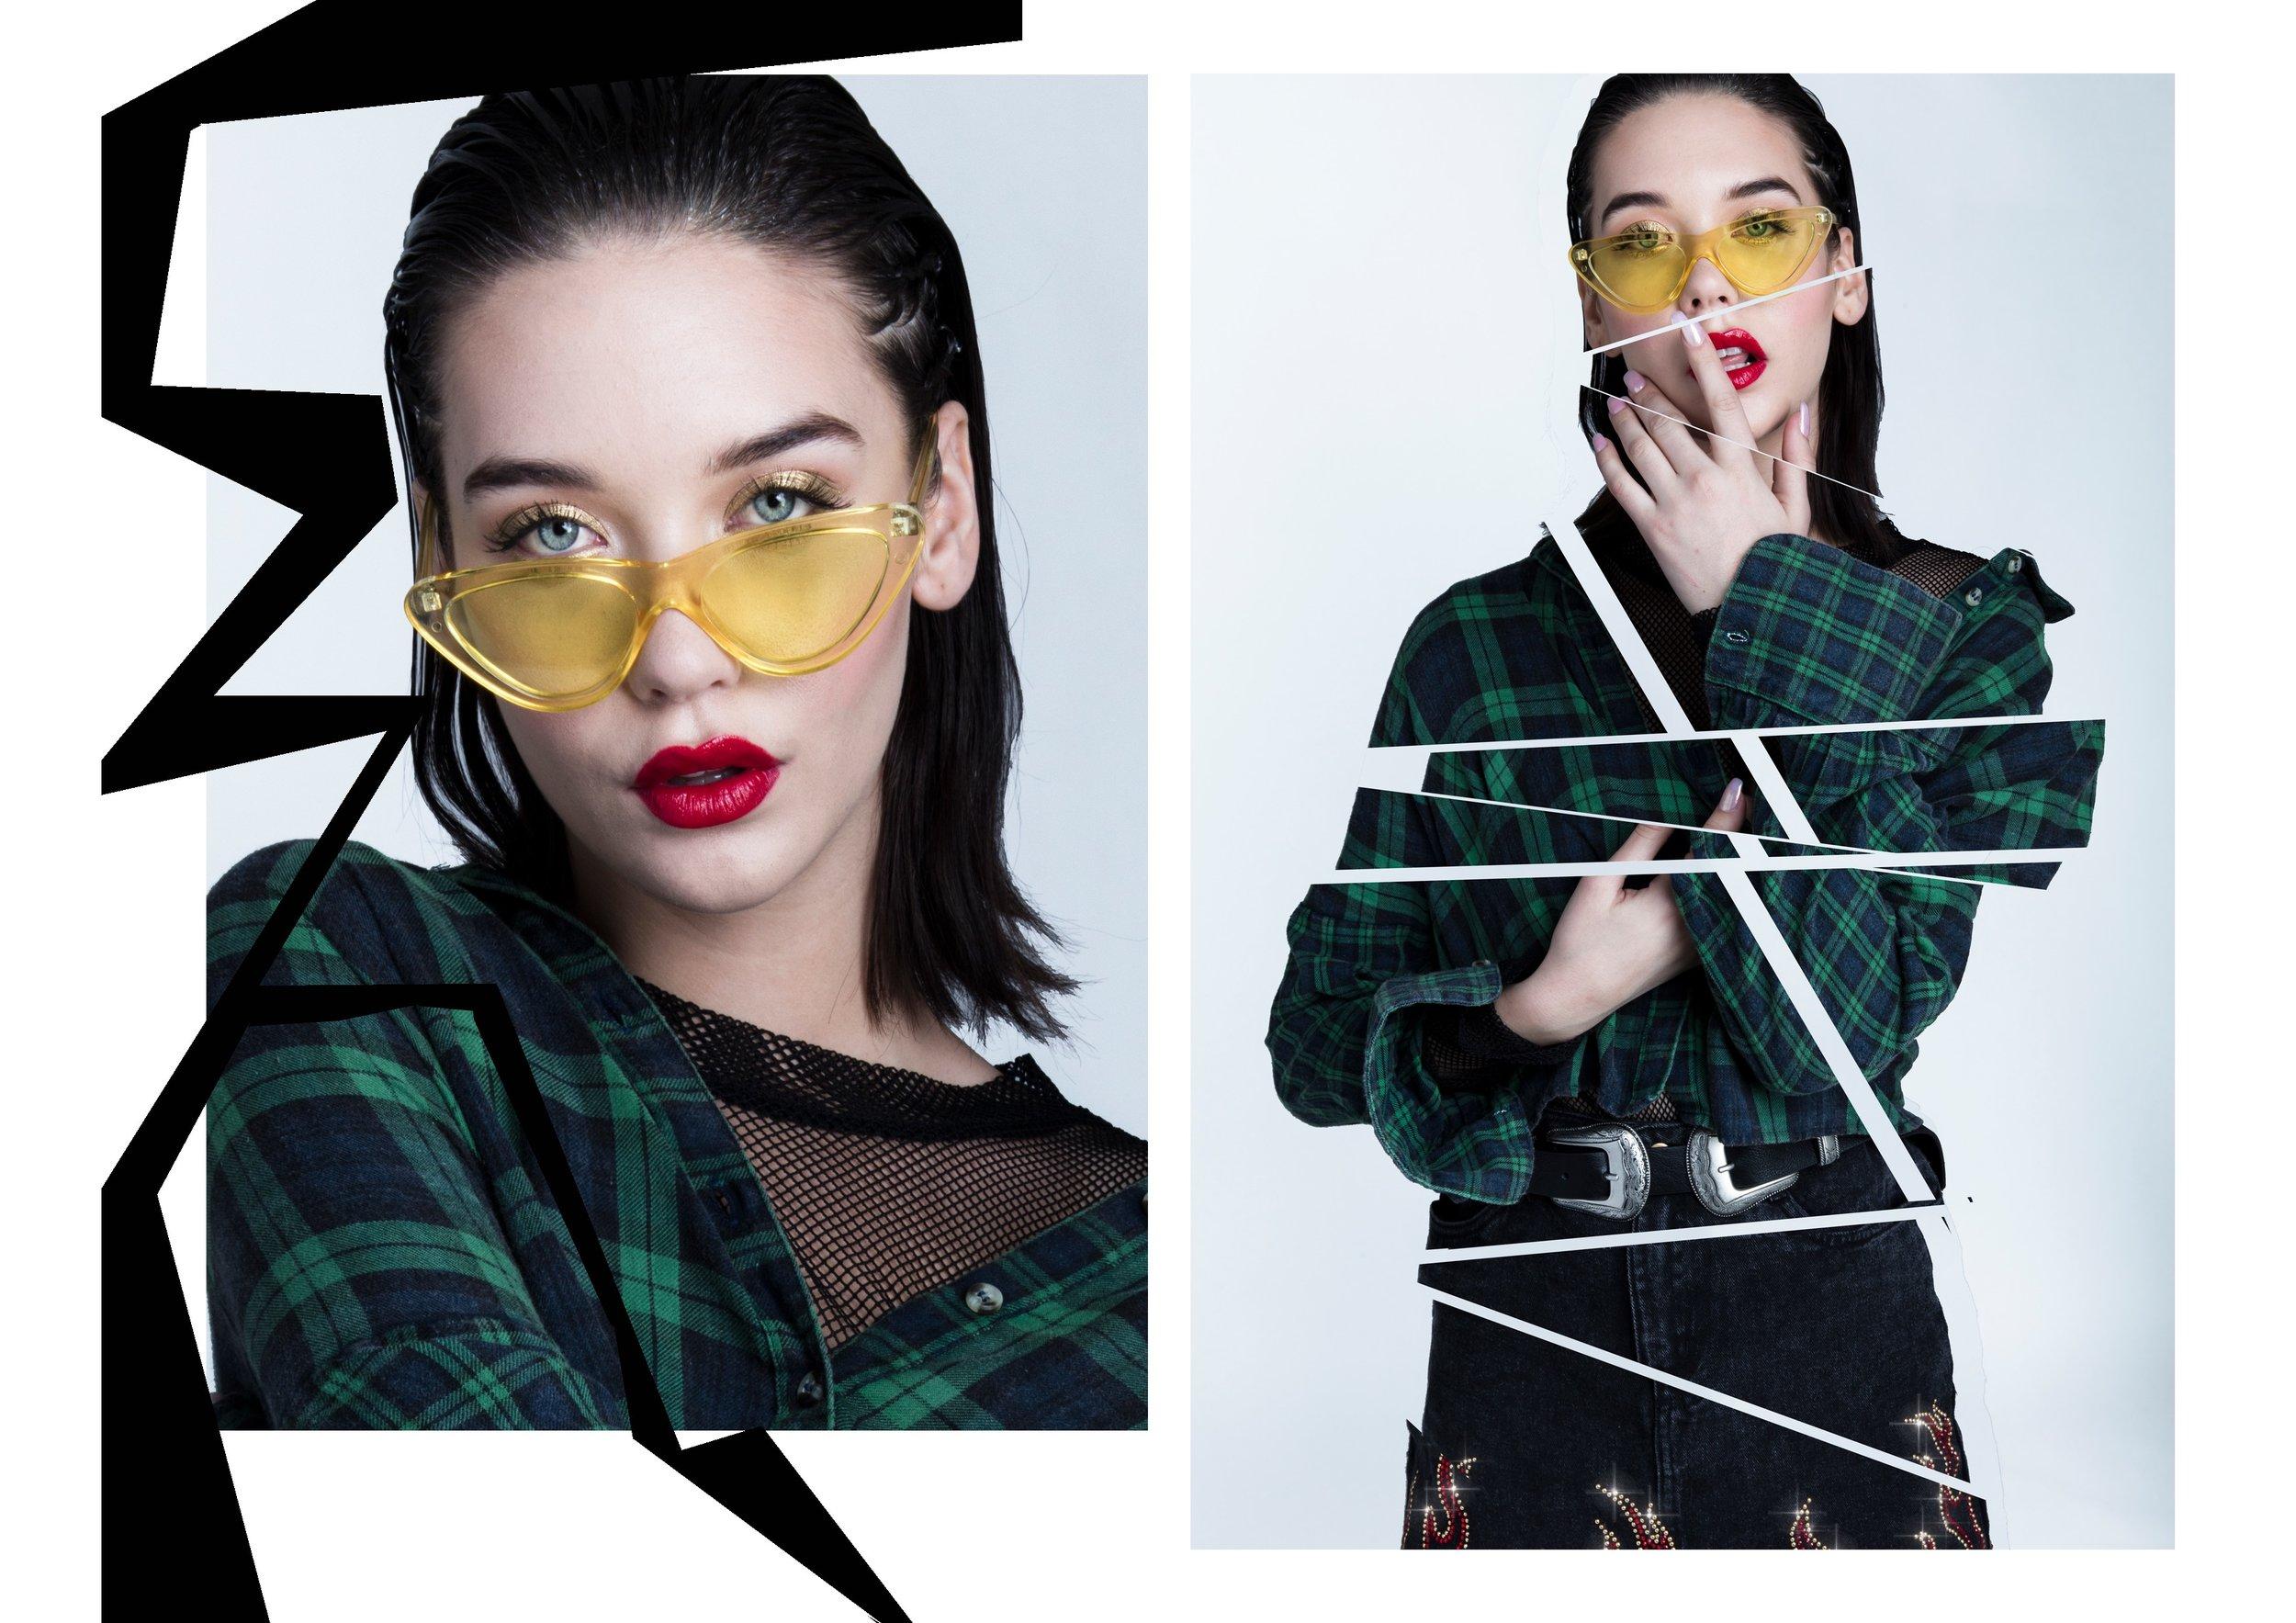 Make-up: Kendal Fedail       Photographer: Mclaren Ray       Hair: Josh Liu       Model: Amanda Steele